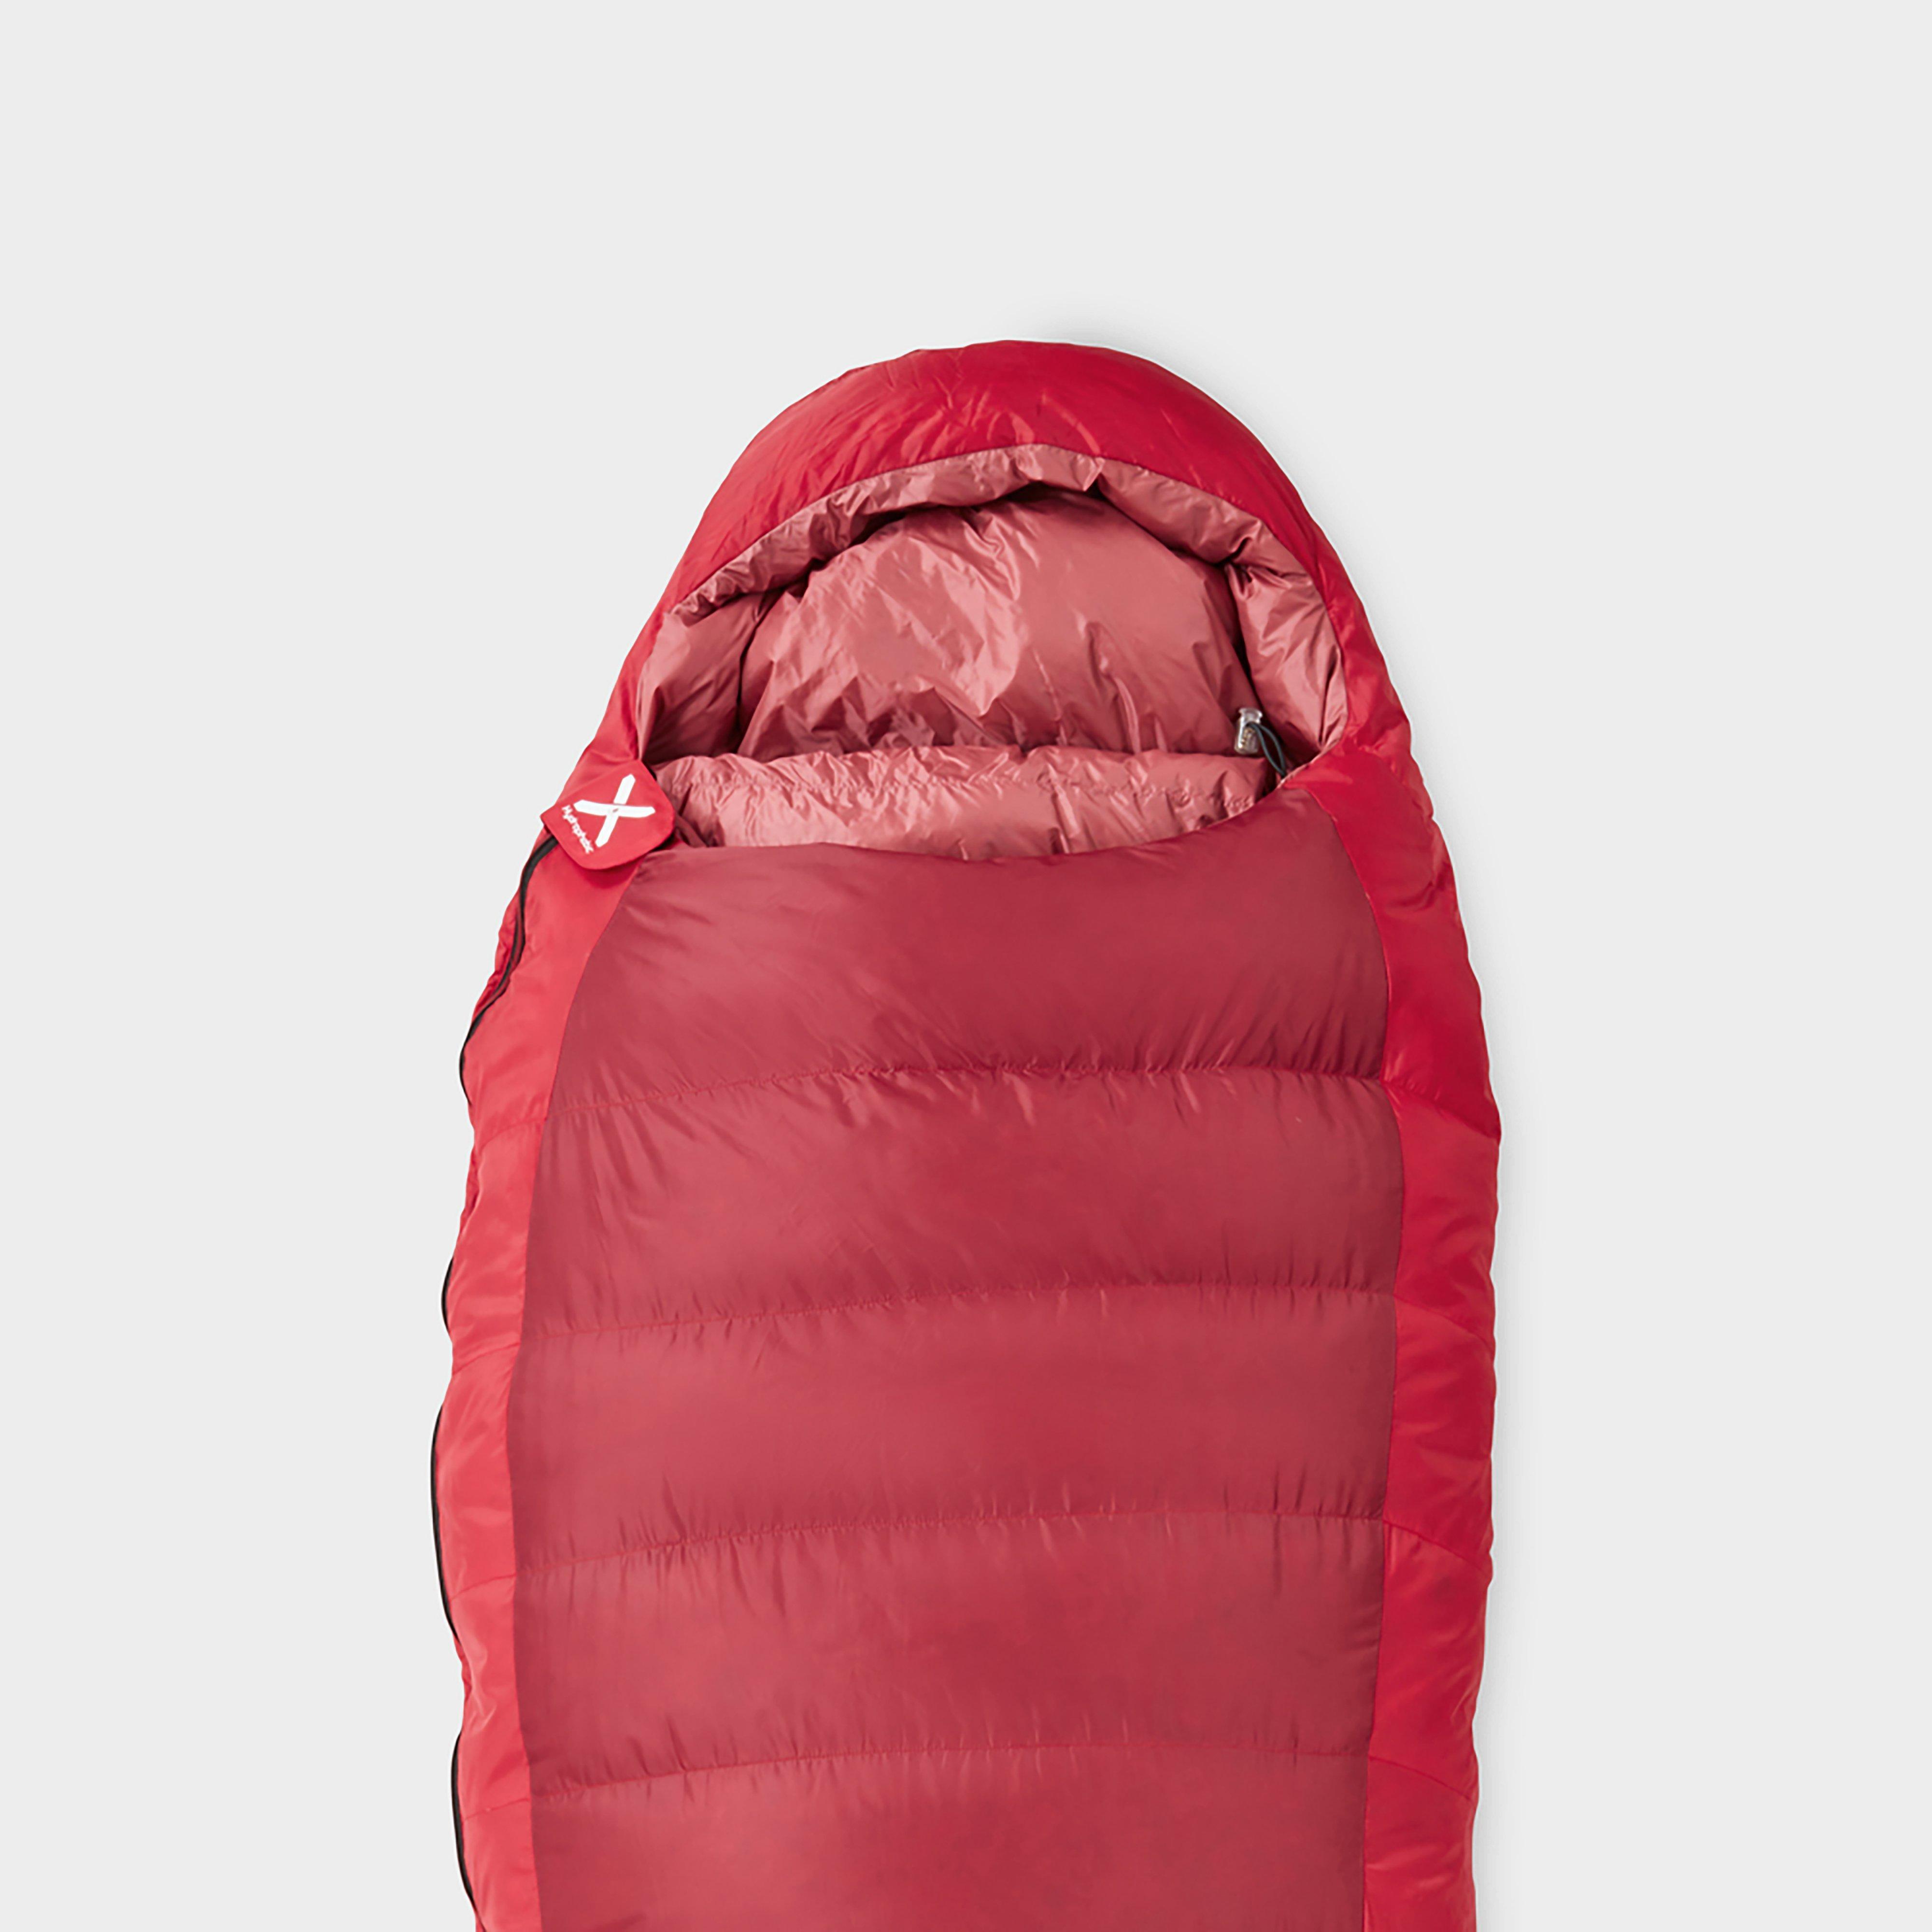 Oex Oex Pepperpot EVF Womens Sleeping Bag